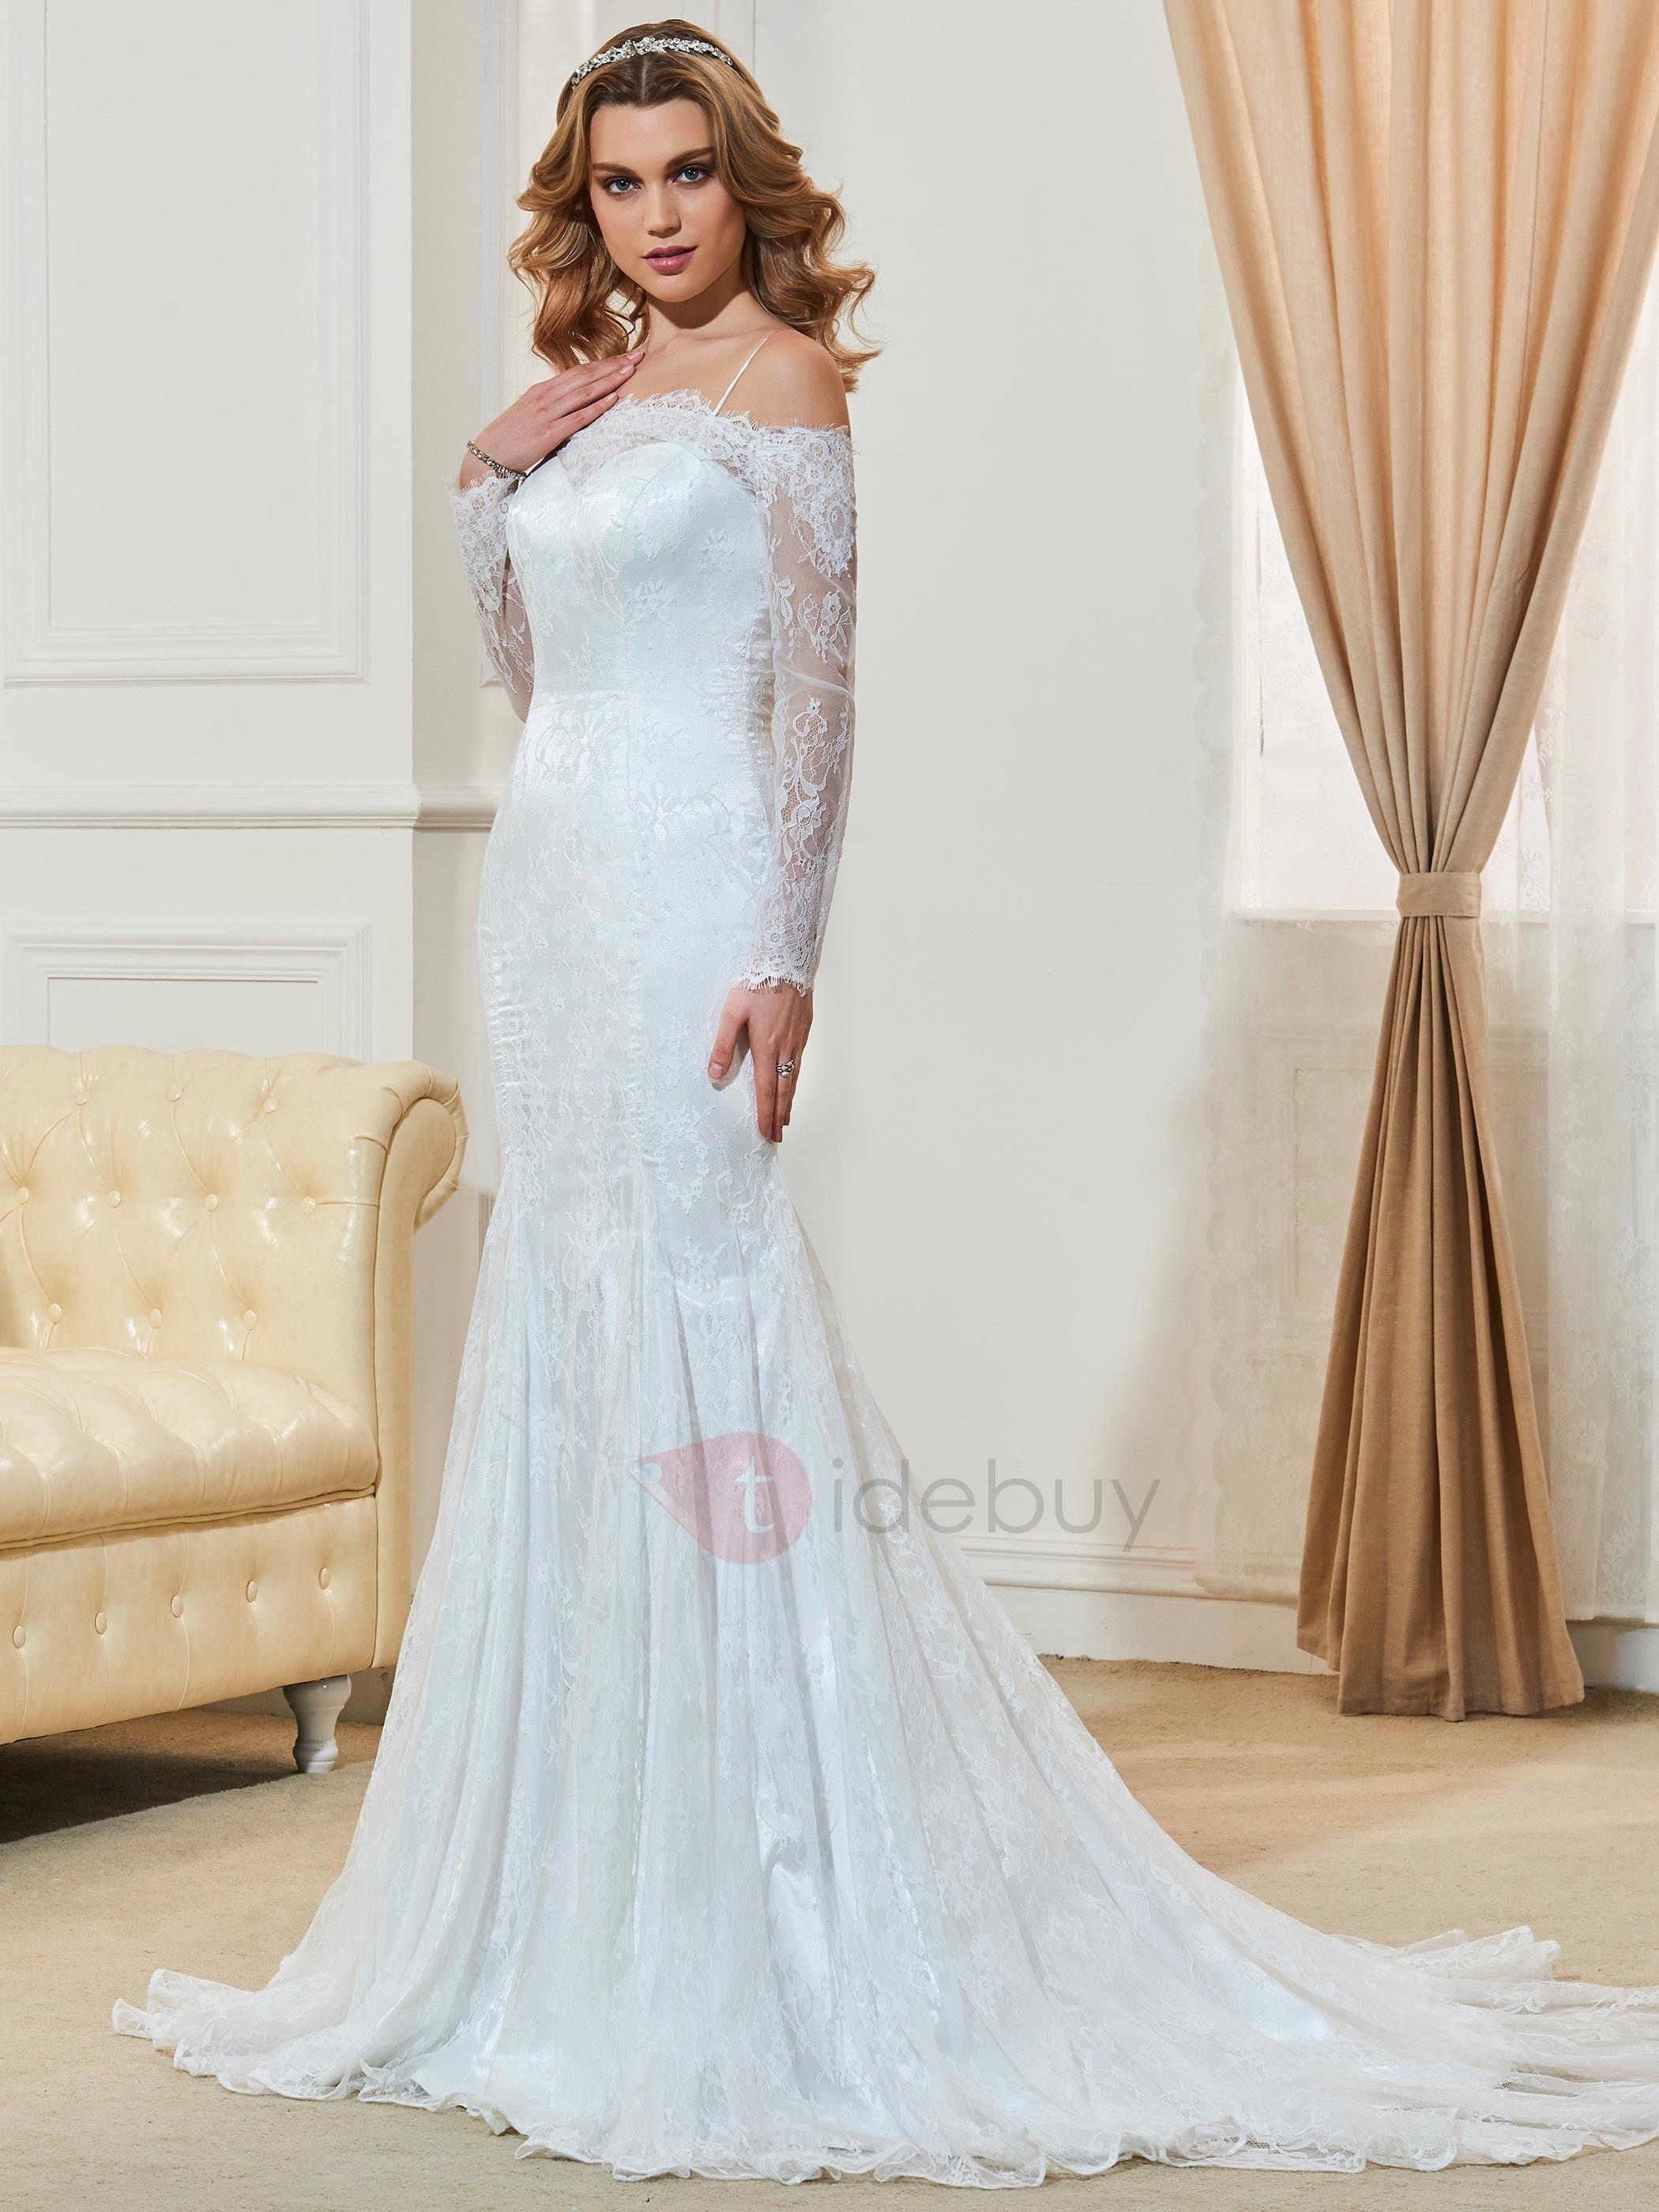 Off the shoulder lace mermaid wedding dress  Off the Shoulder Lace Long Sleeves Mermaid Wedding Dress  Wedding